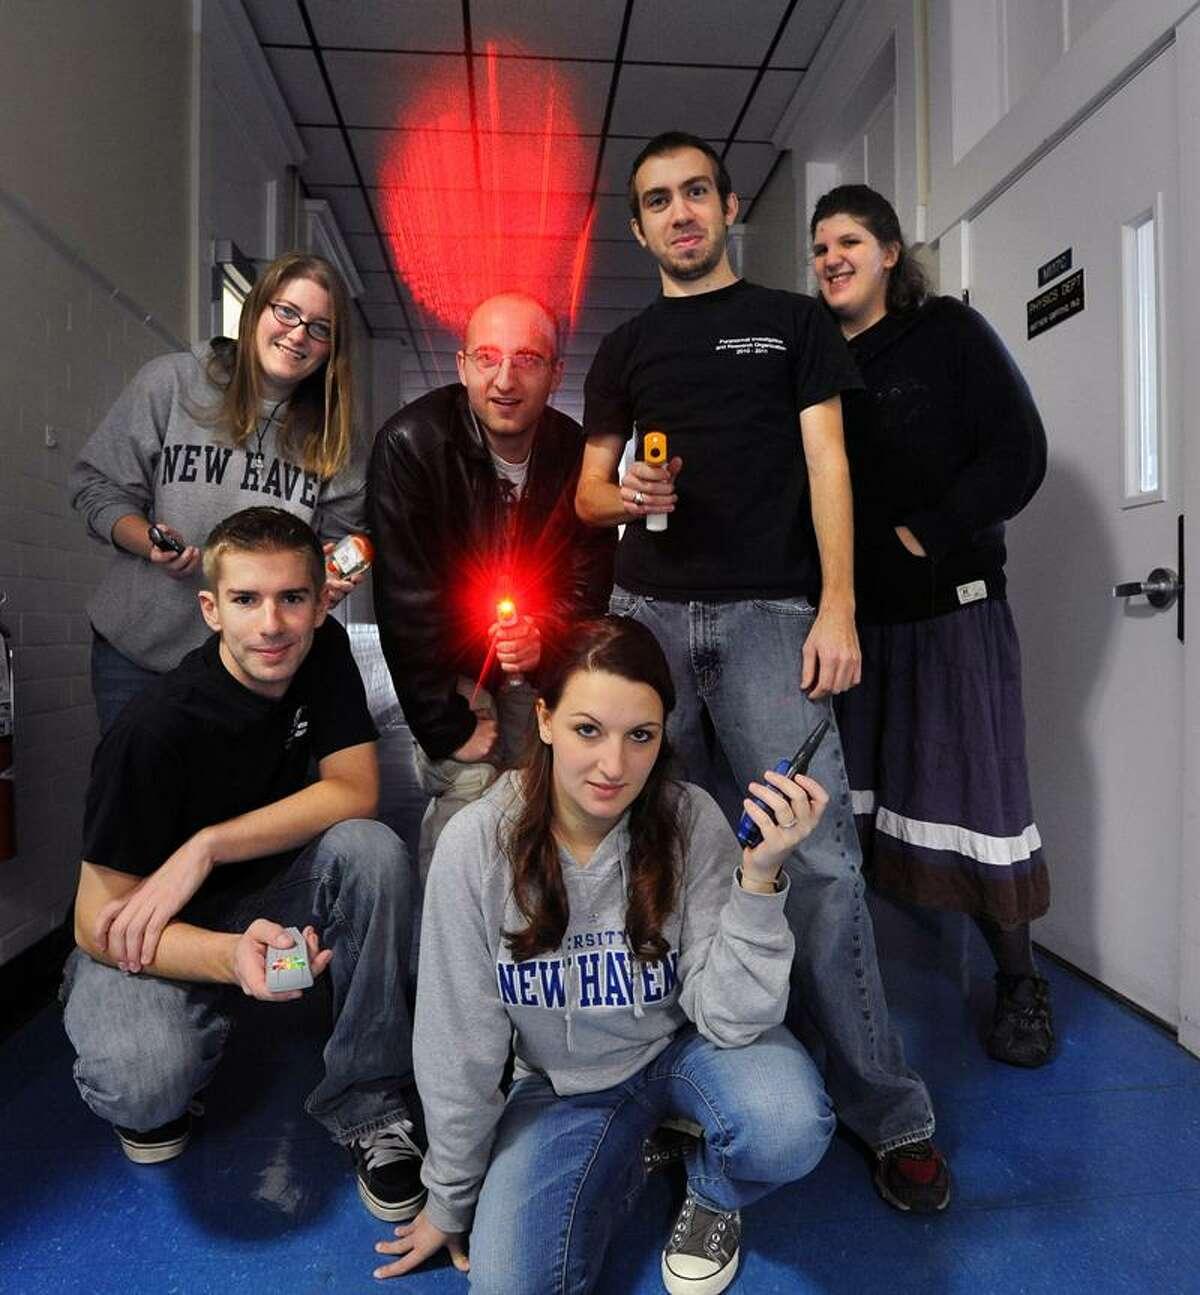 Members of PIRO at UNH (Ghost hunters). Peter Casolino/Register